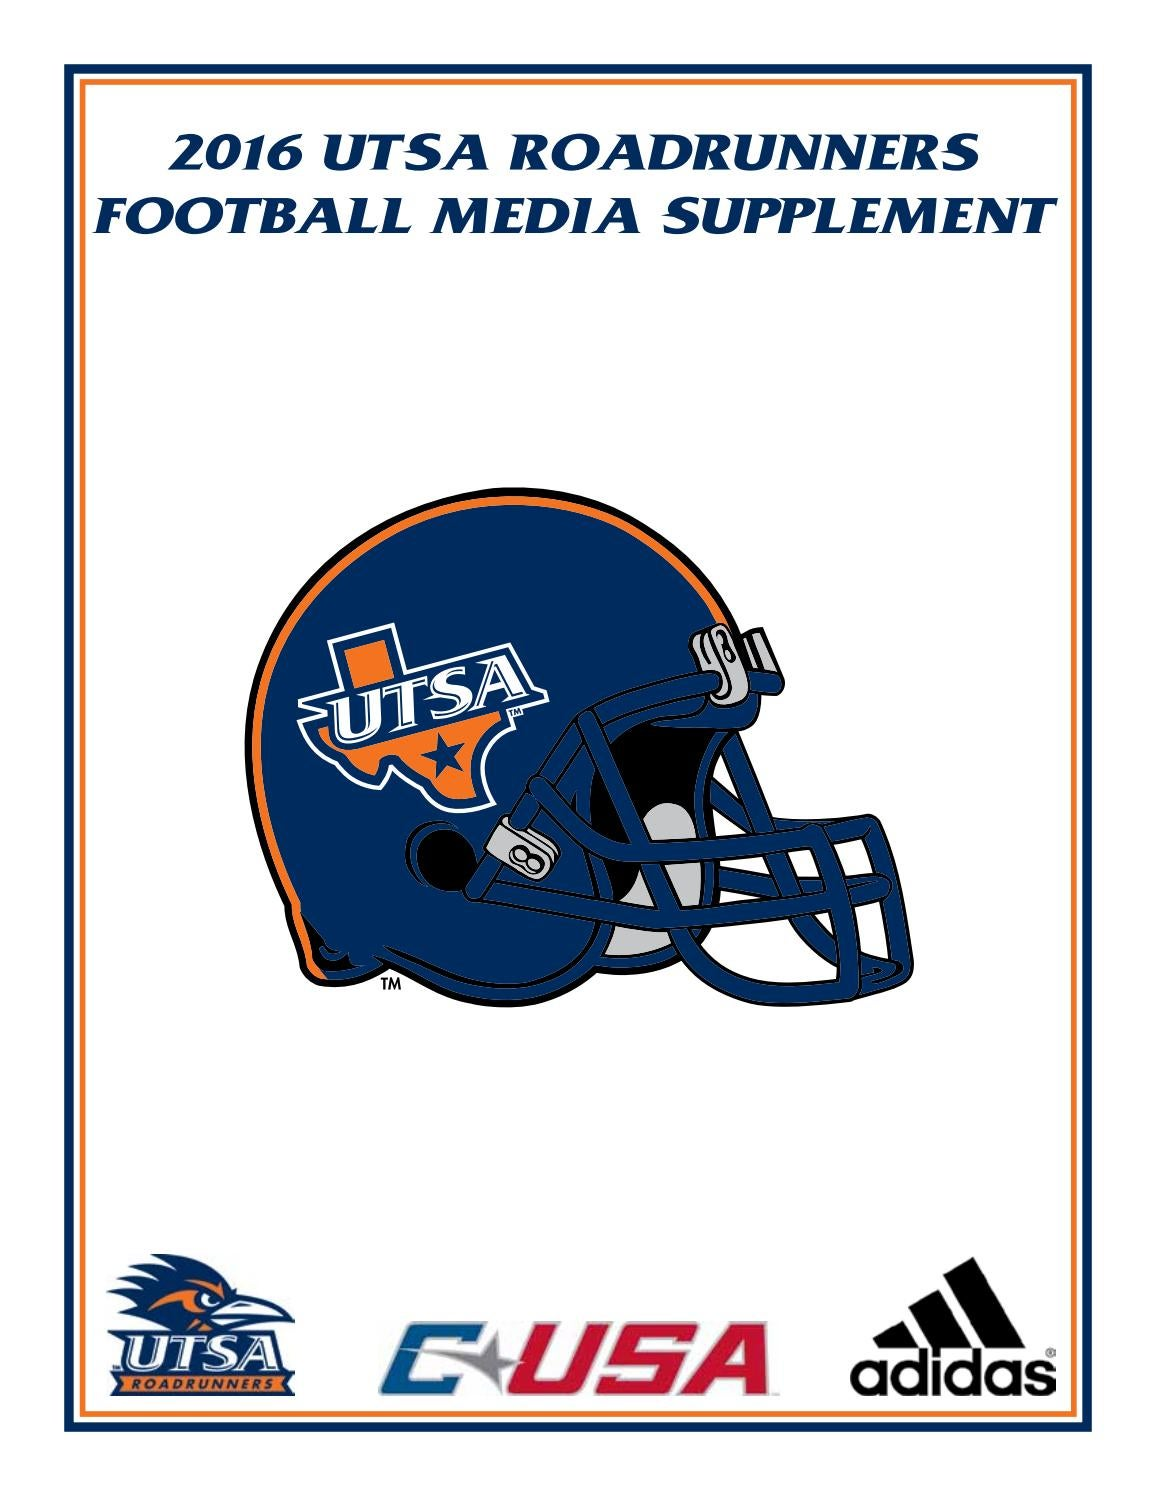 d47ca8691ec1 2016 UTSA Football Almanac by UTSA Athletics Communications - issuu